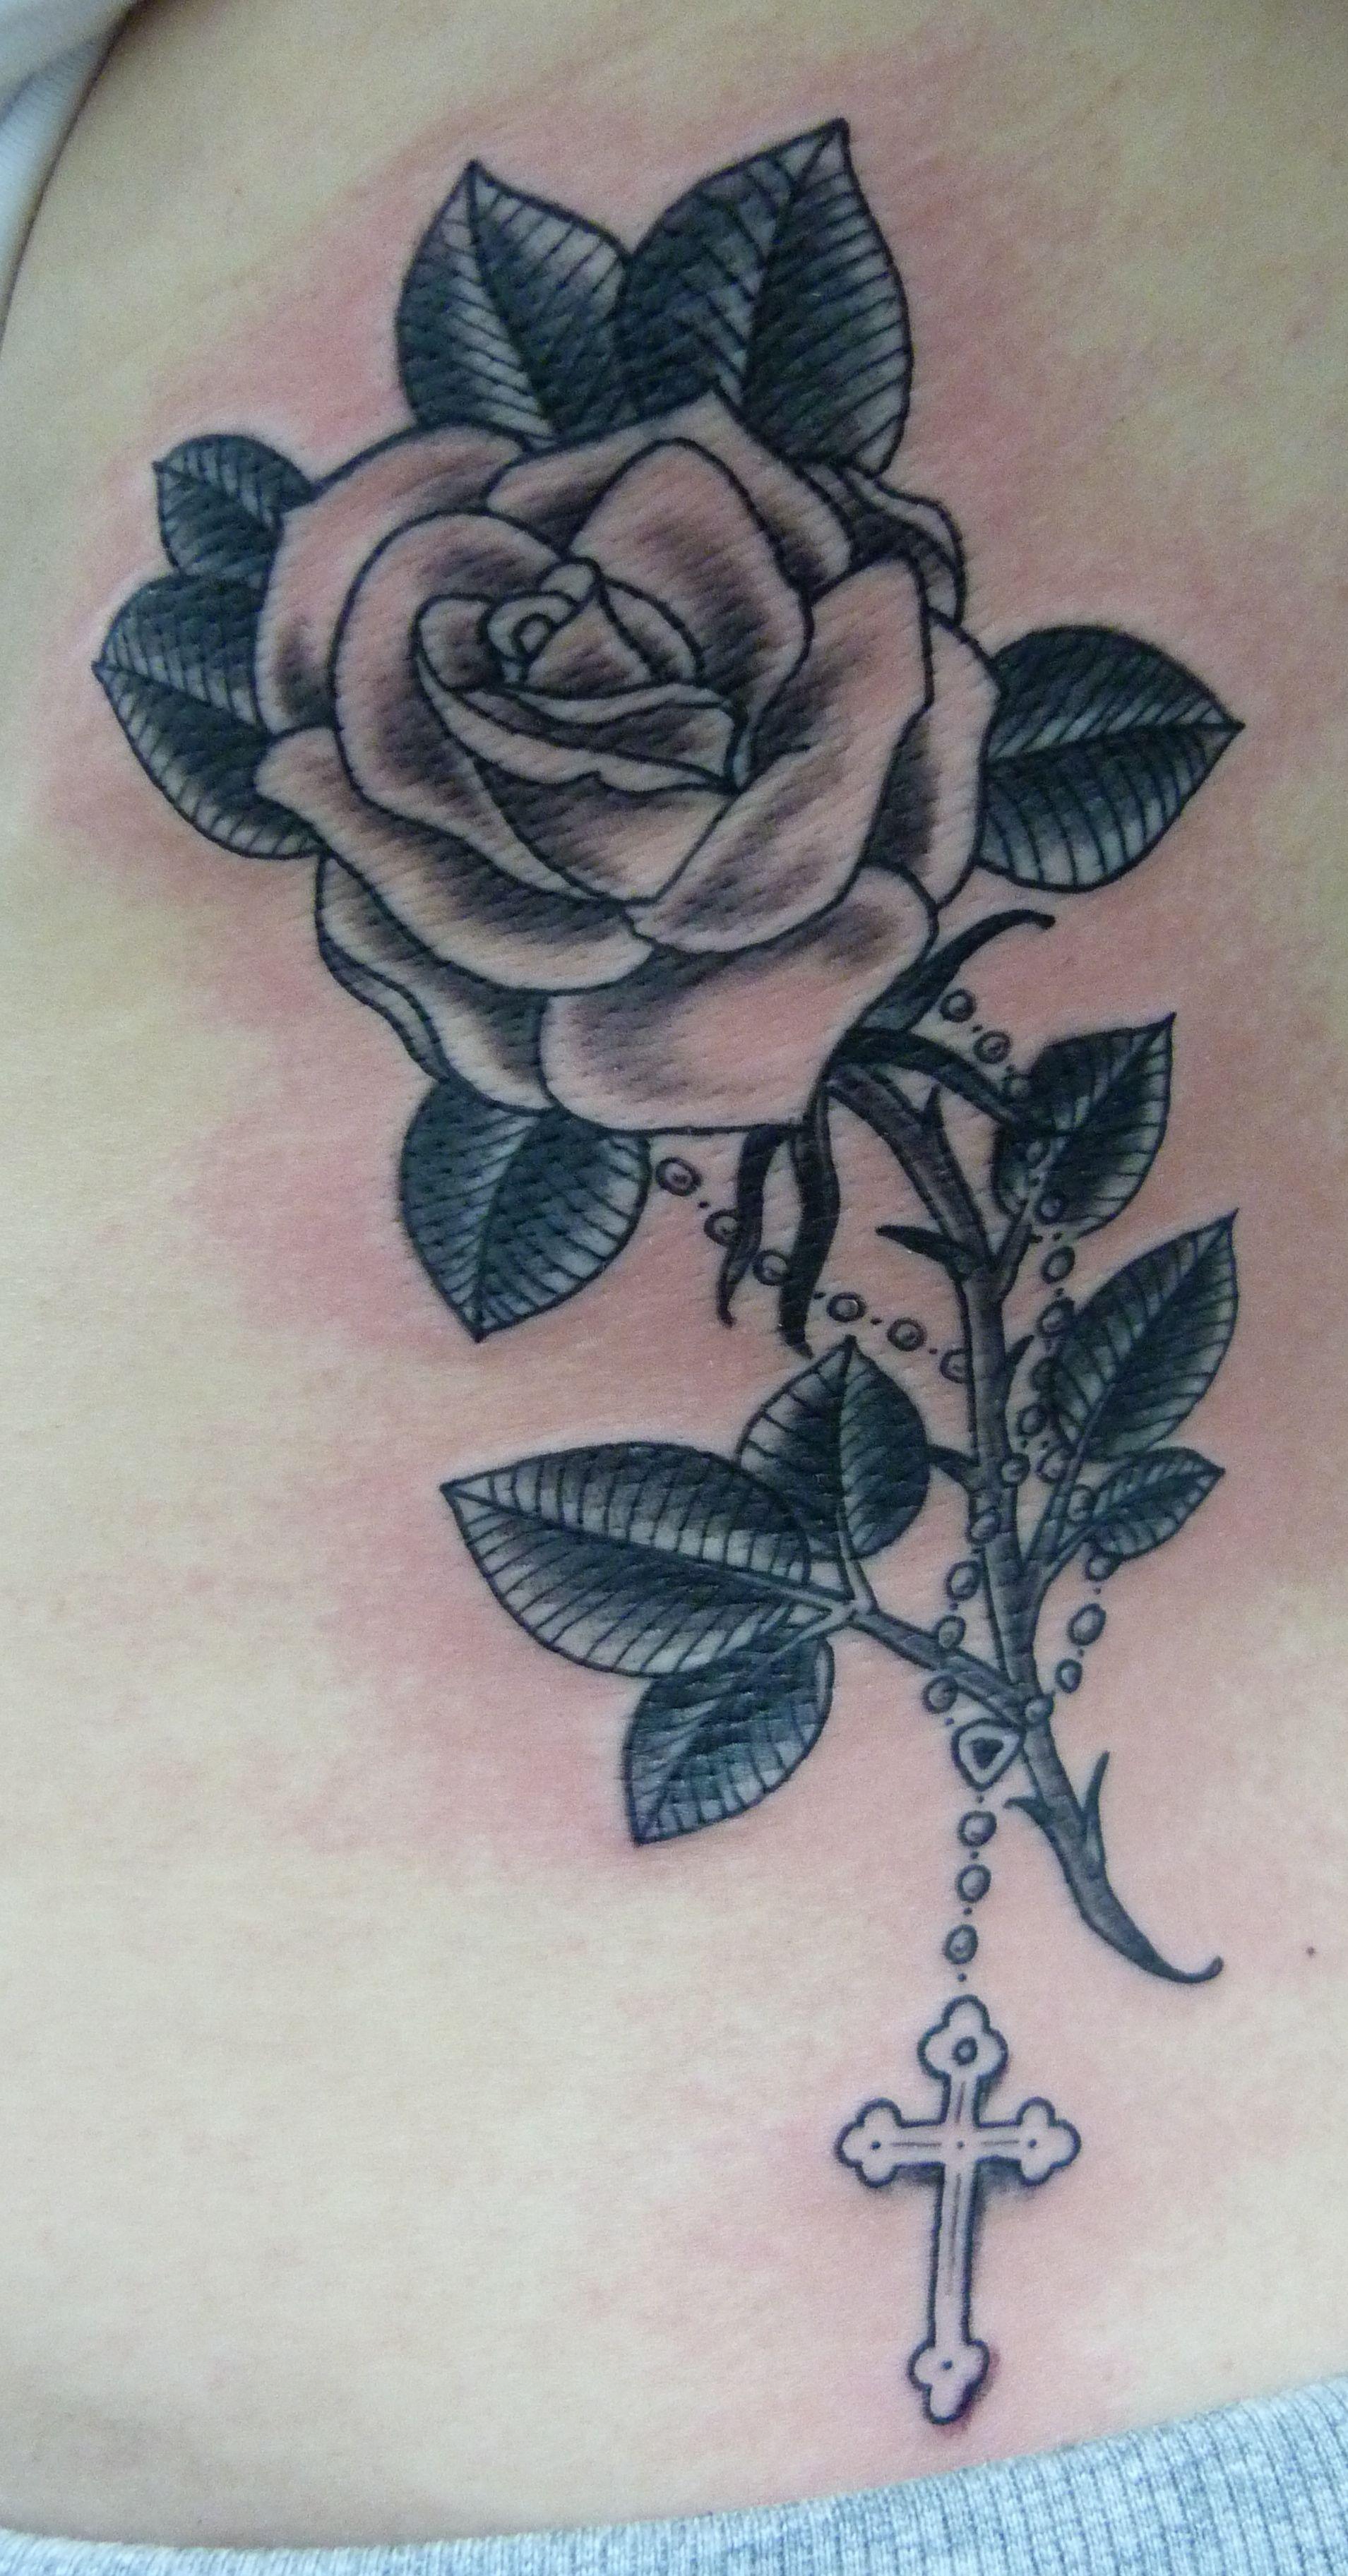 Pin Em Tattoos I Want Or Like